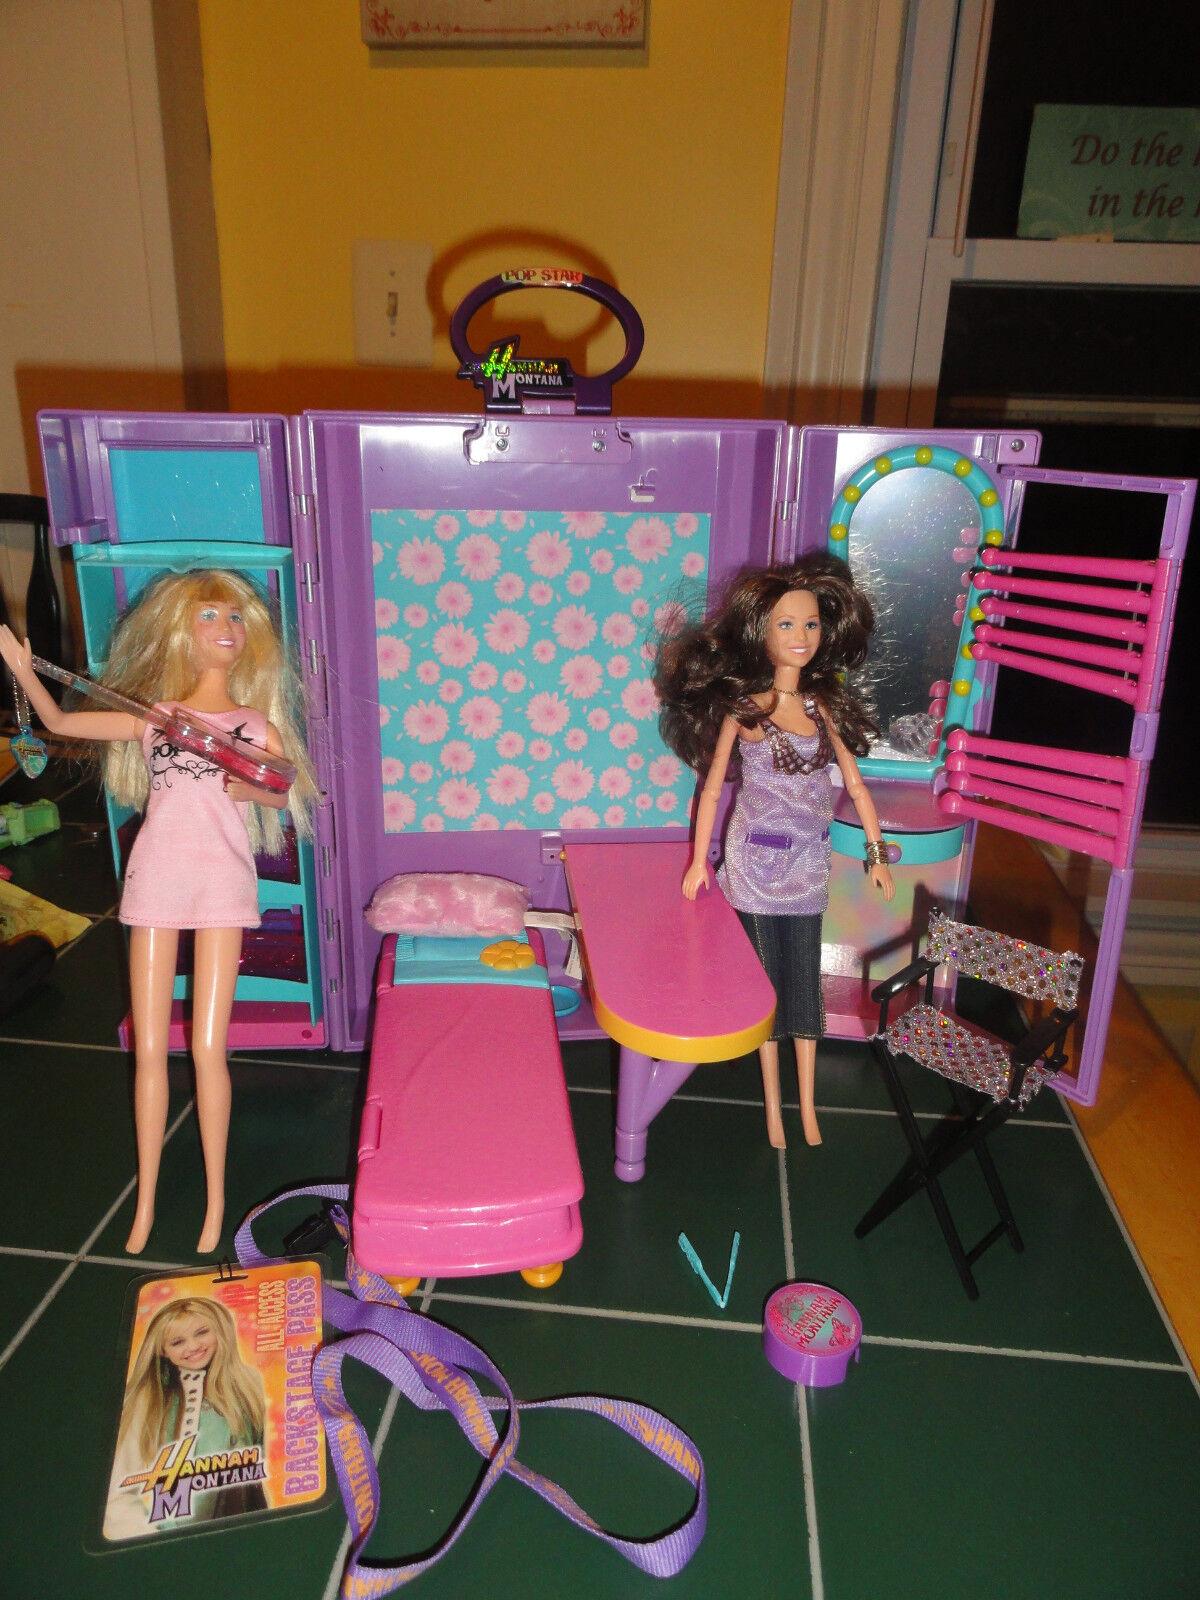 HANNAH MONTANA Secret Celebrity Carrying Case+2 Hannah Dolls.1 sings+Xtras Rare